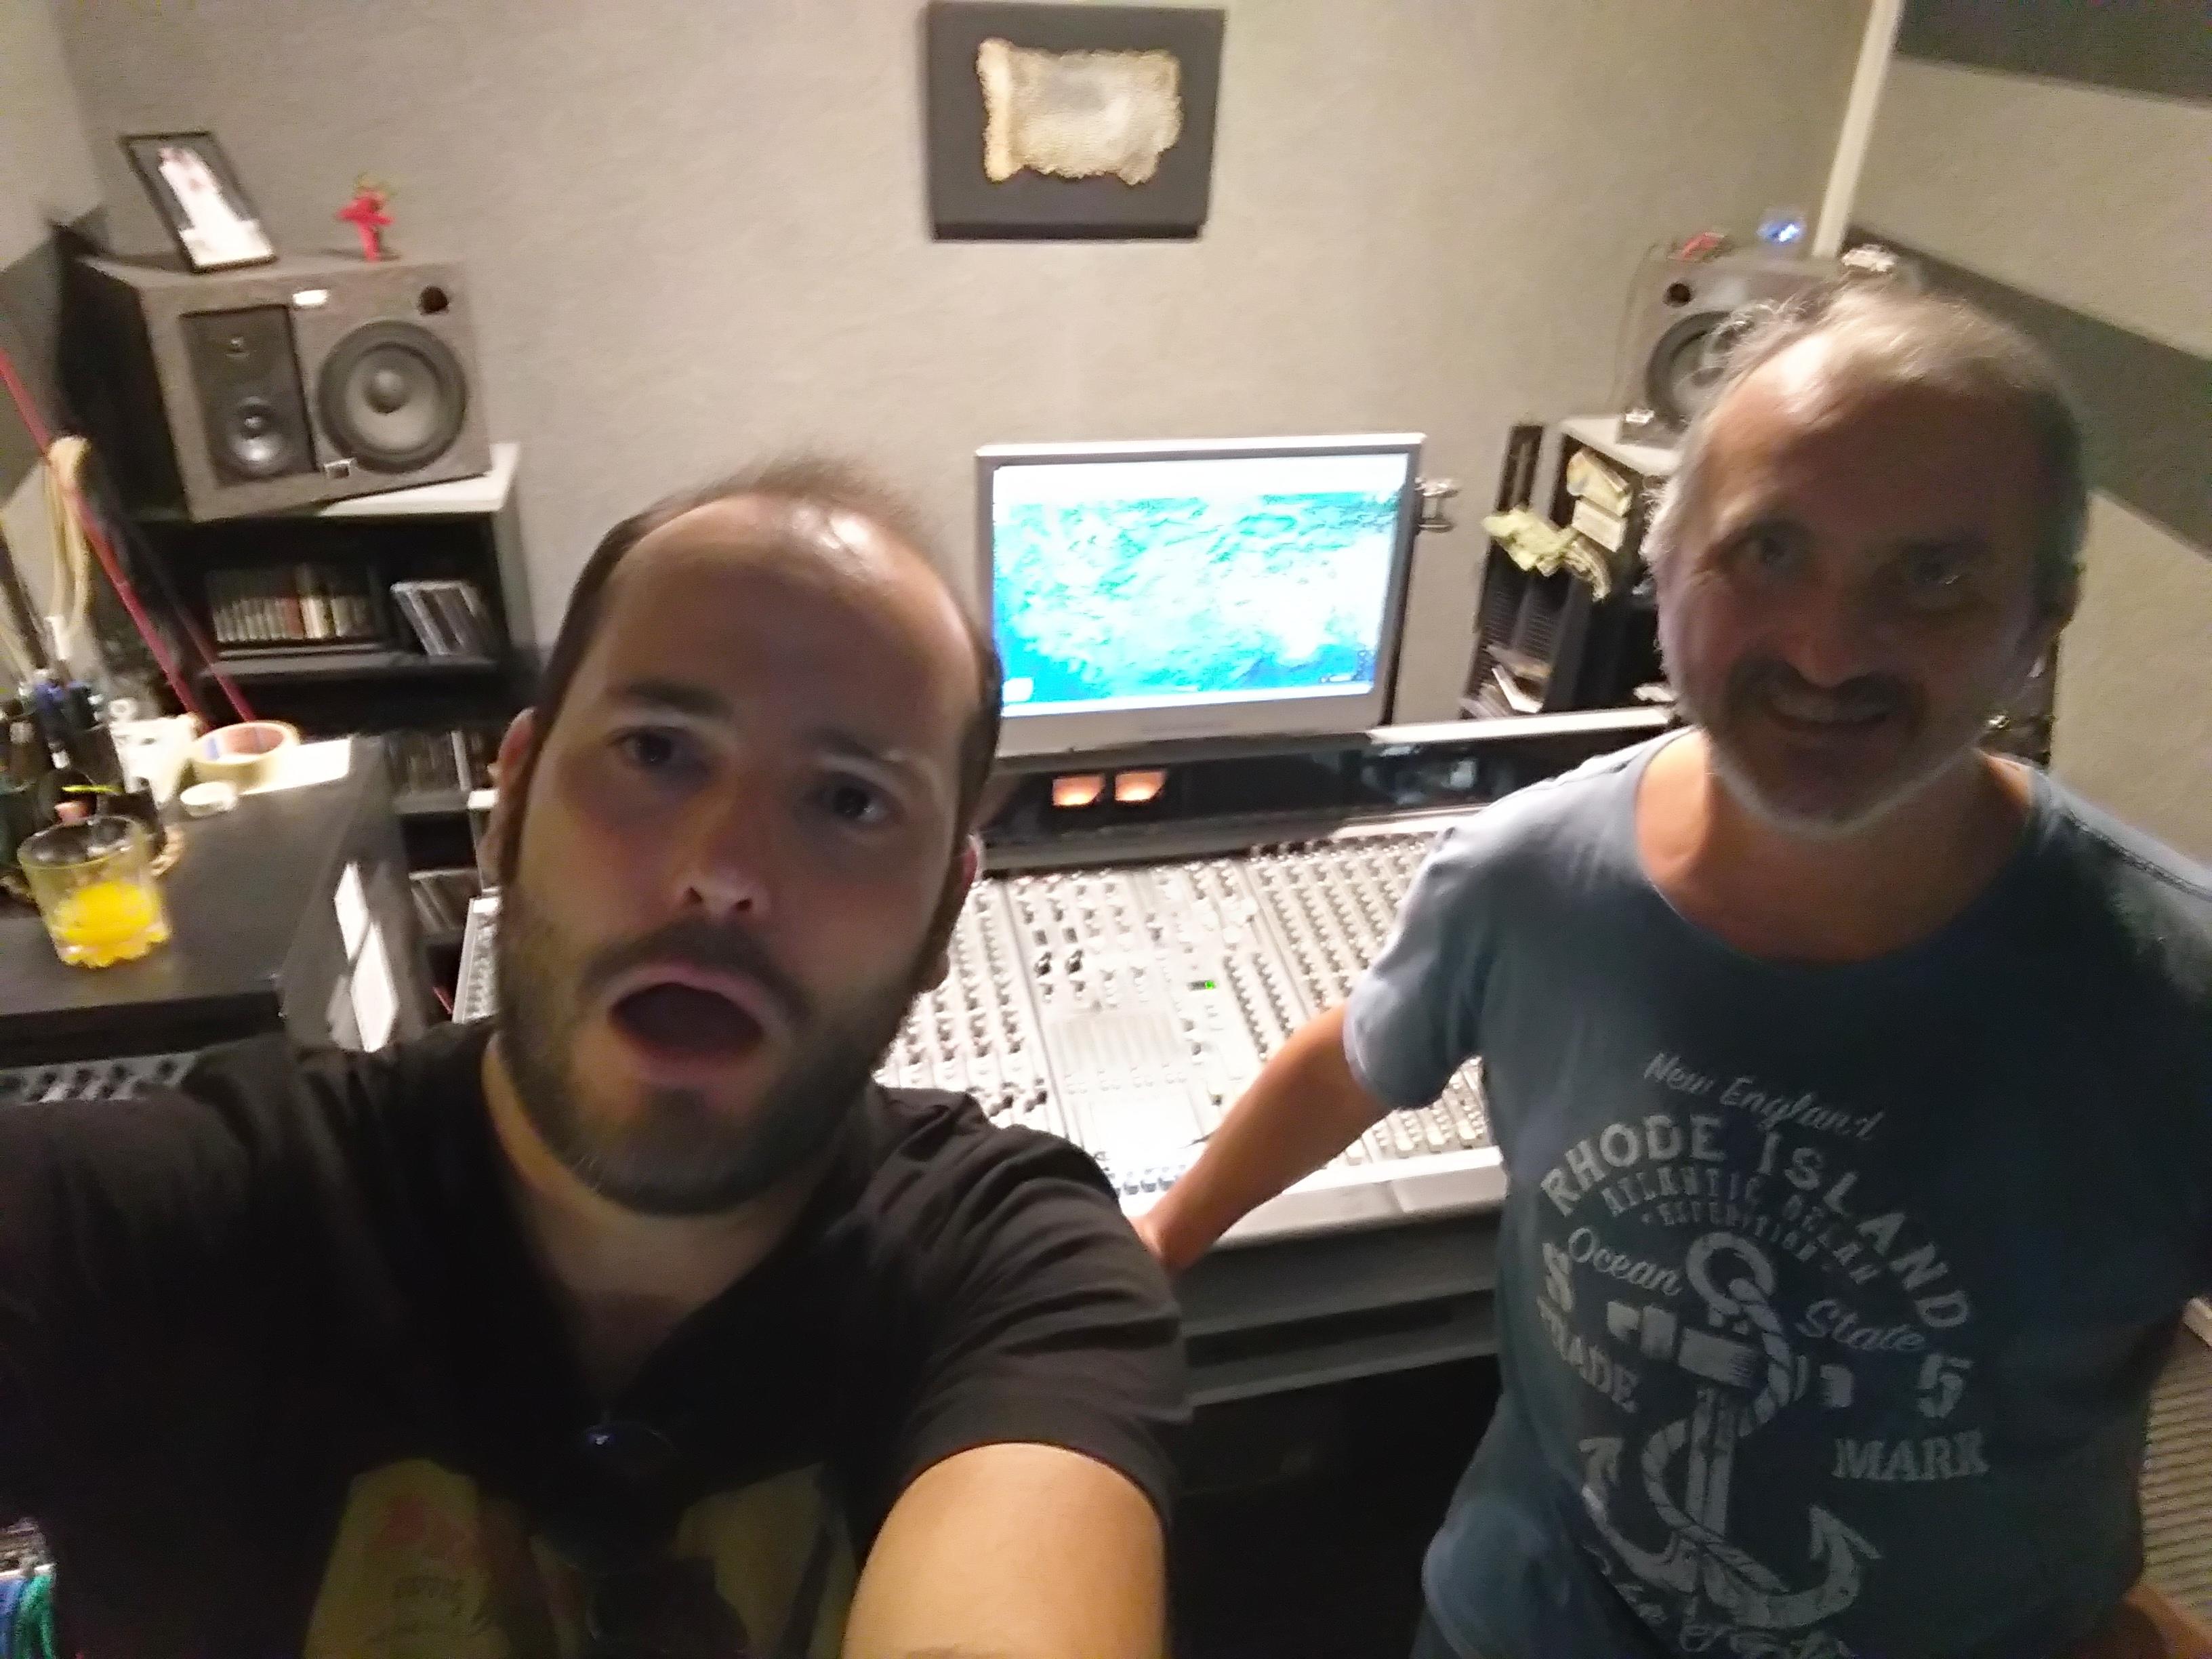 Studio 5 Interview with ΓΡΗΓΟΡΗΣ ΠΑΠΑΠΑΝΑΓΙΩΤΟΥ (Grigoris Papapanagiotou)